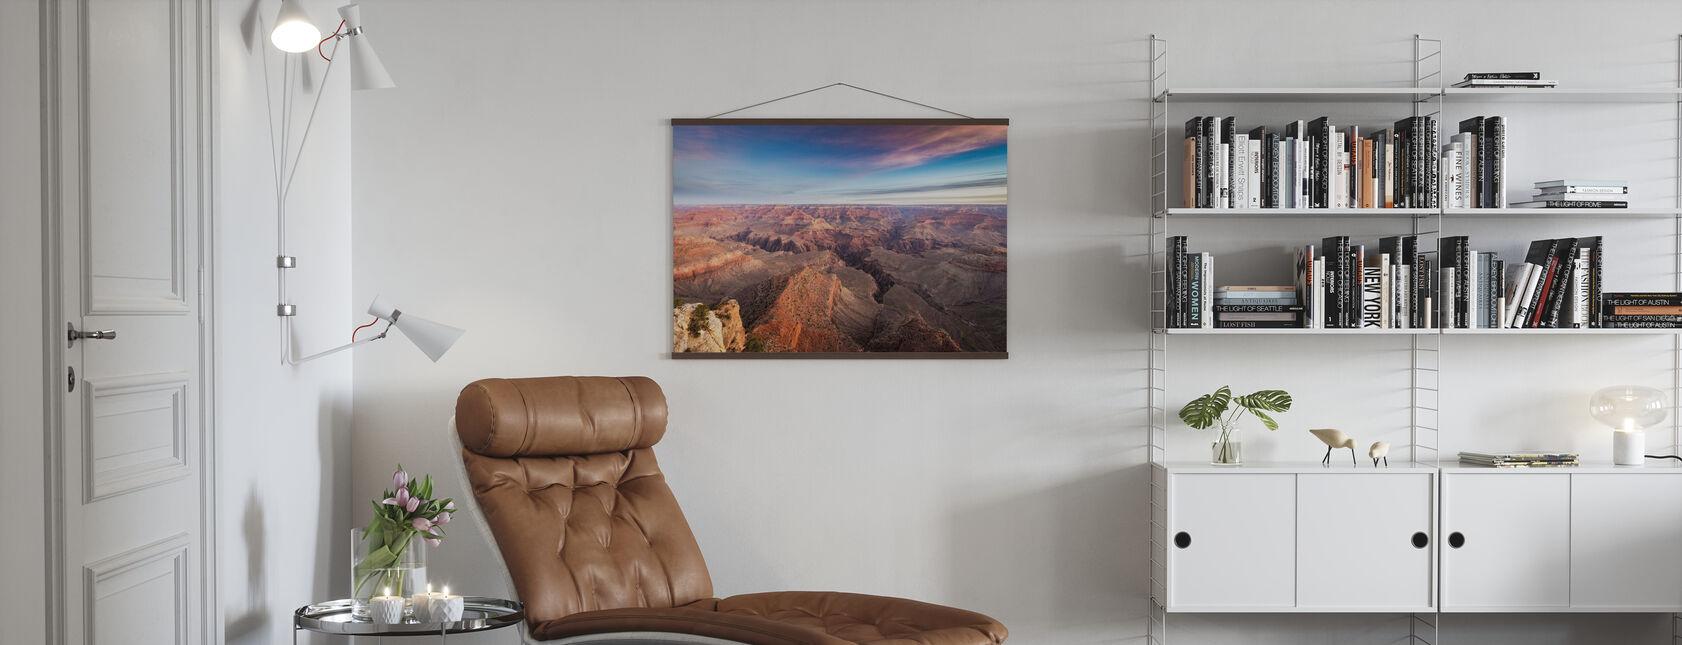 Grand Canyon-Nationalpark - Poster - Wohnzimmer